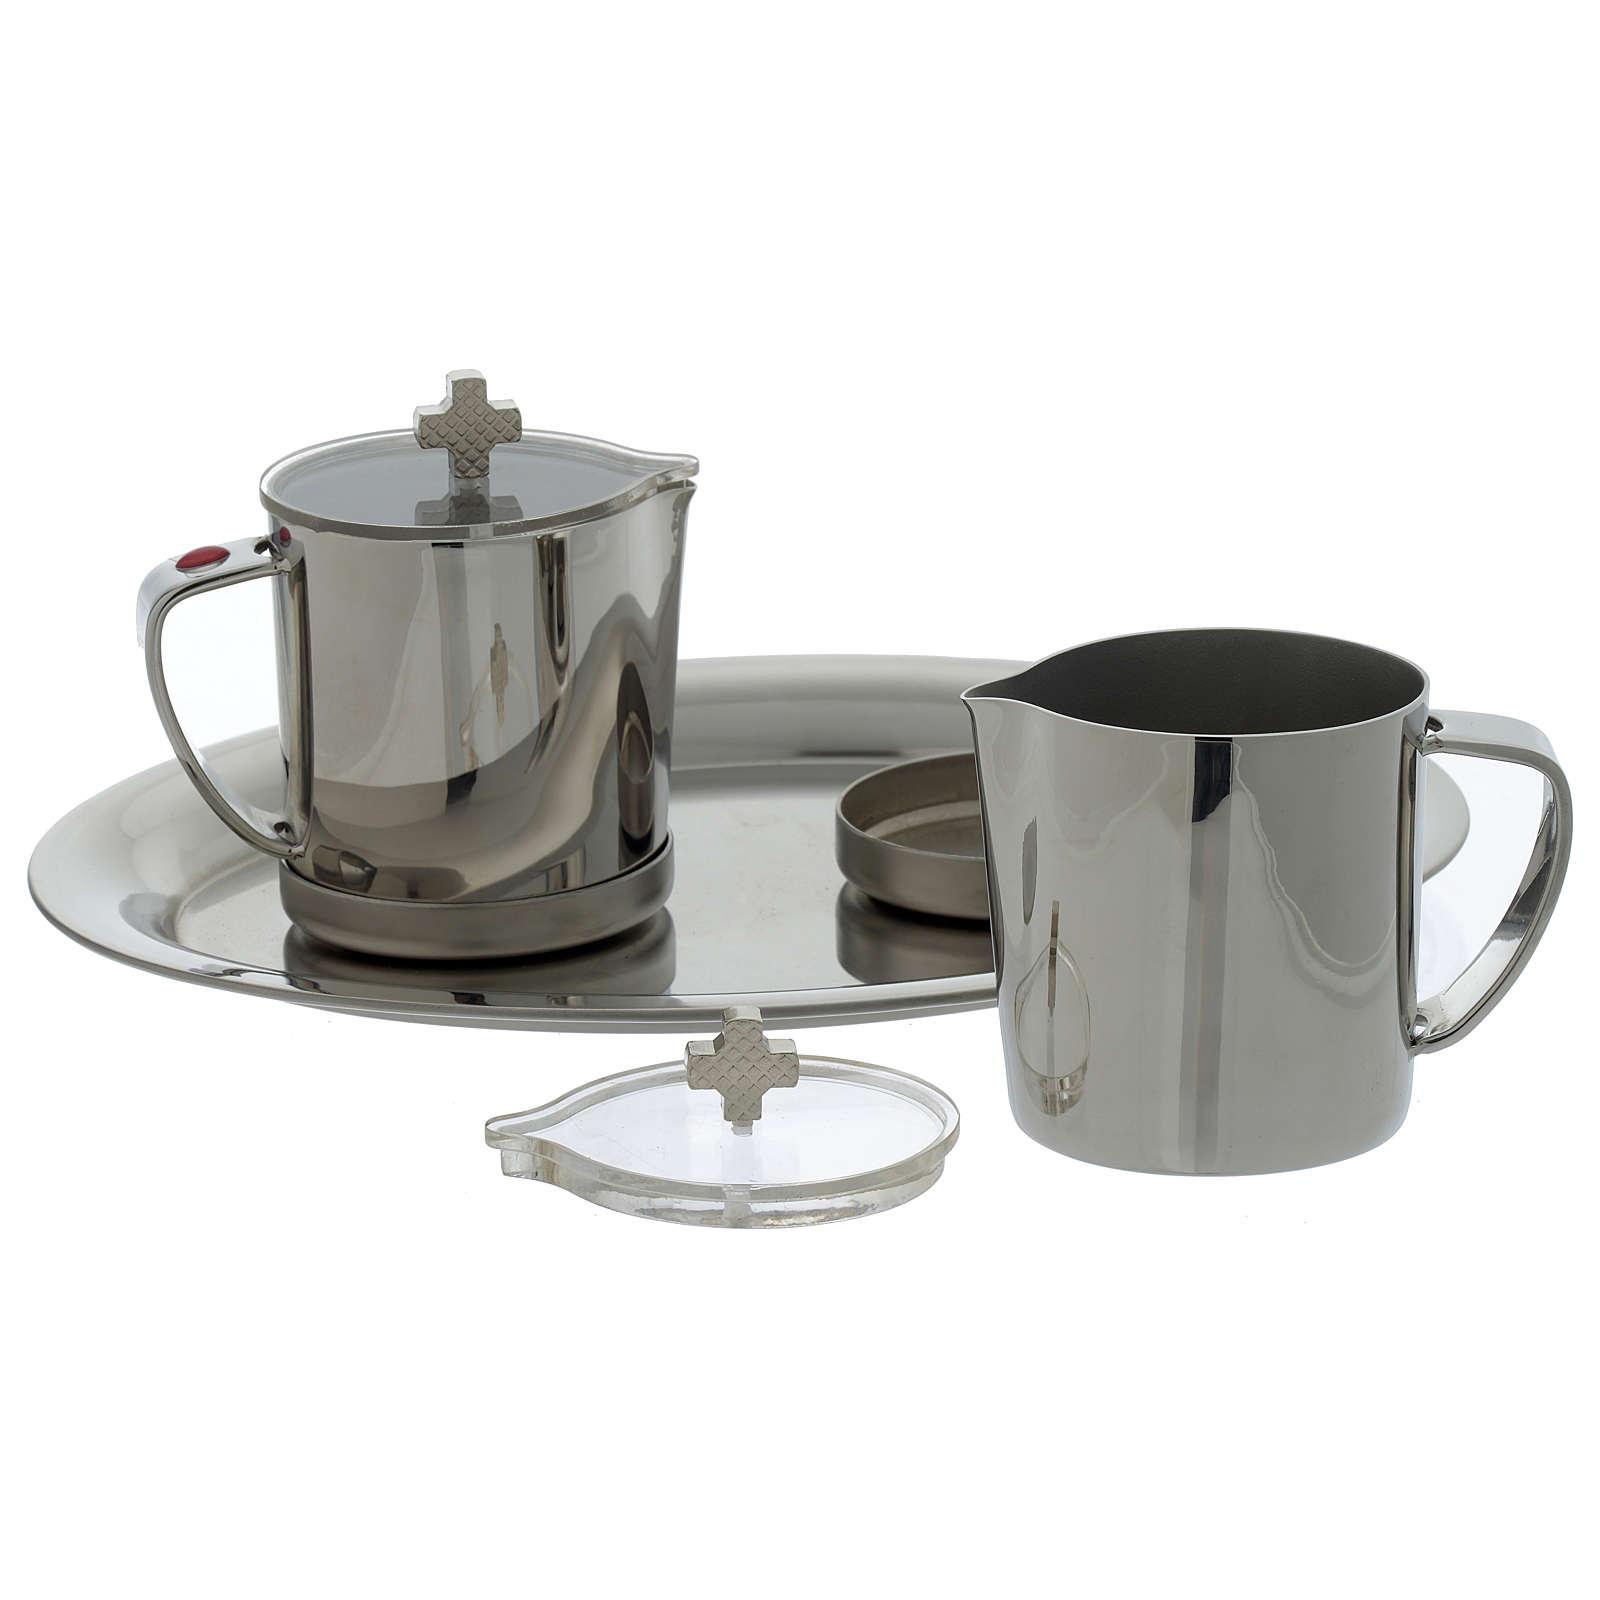 Stainelss steel cruets for mass metal handle 4